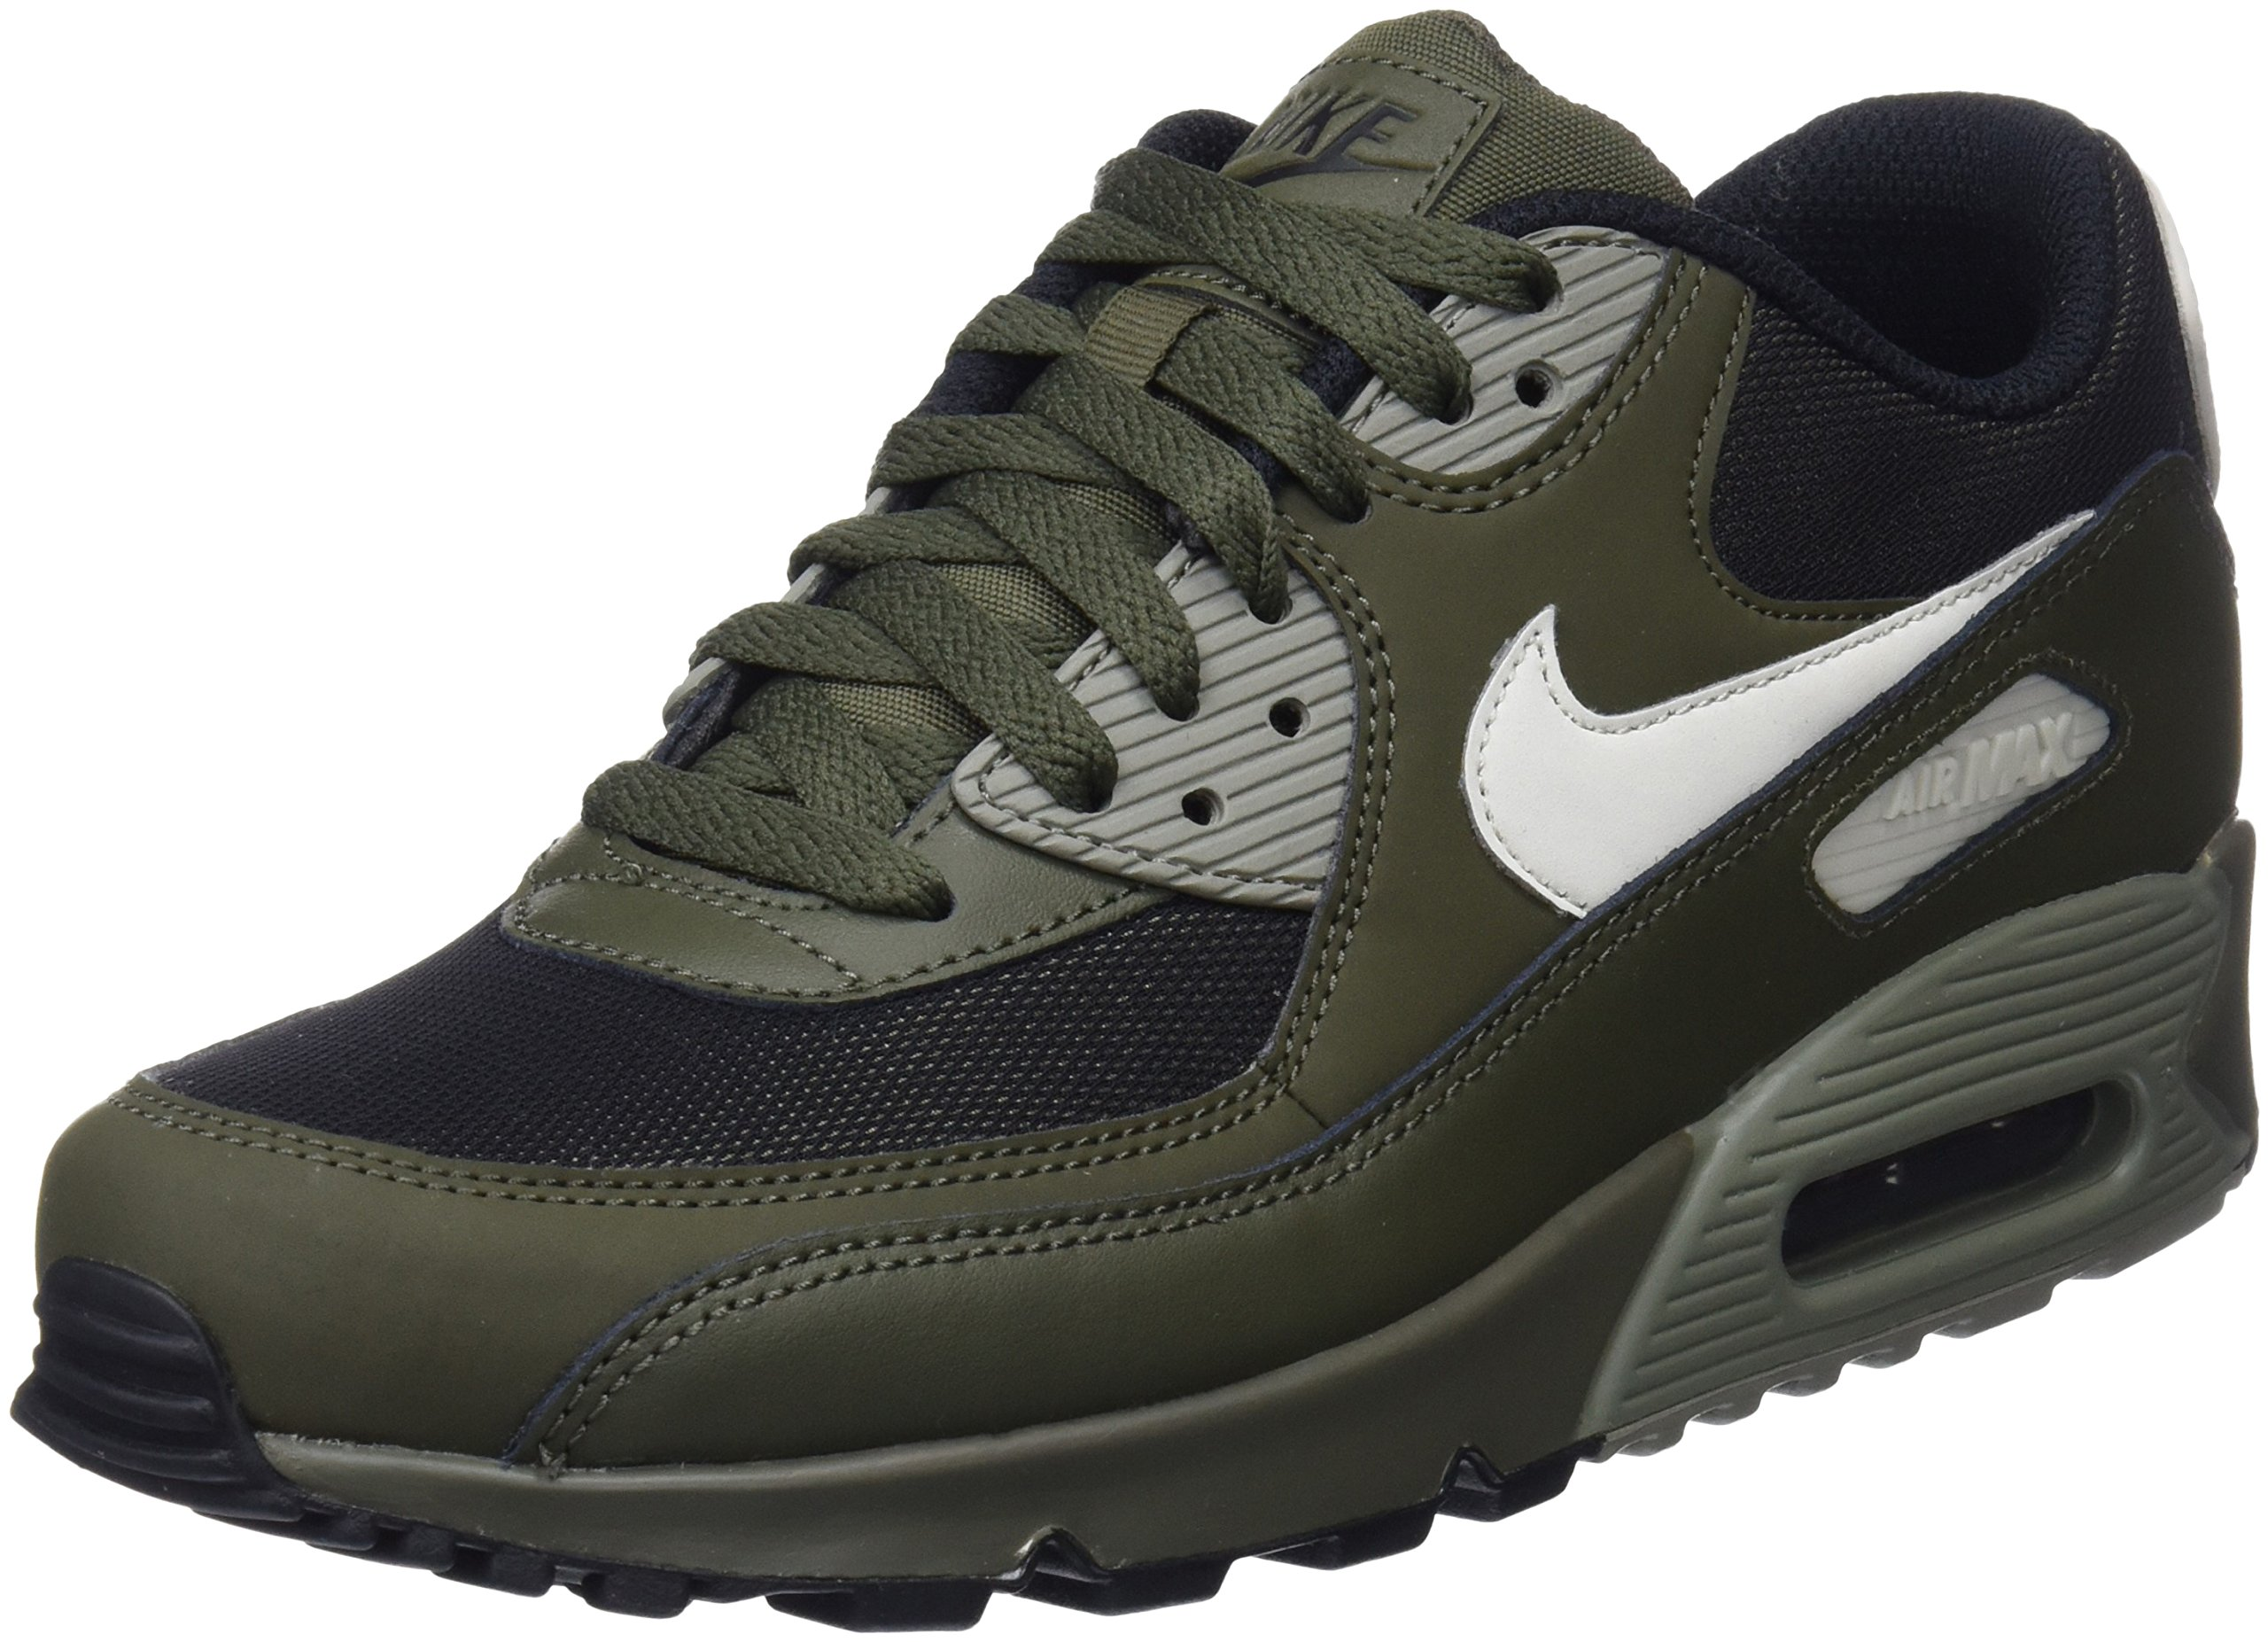 sale retailer aa62d 49f24 Galleon - NIKE Men s Air Max  90 Shoes Cargo Khaki Light Bone 10